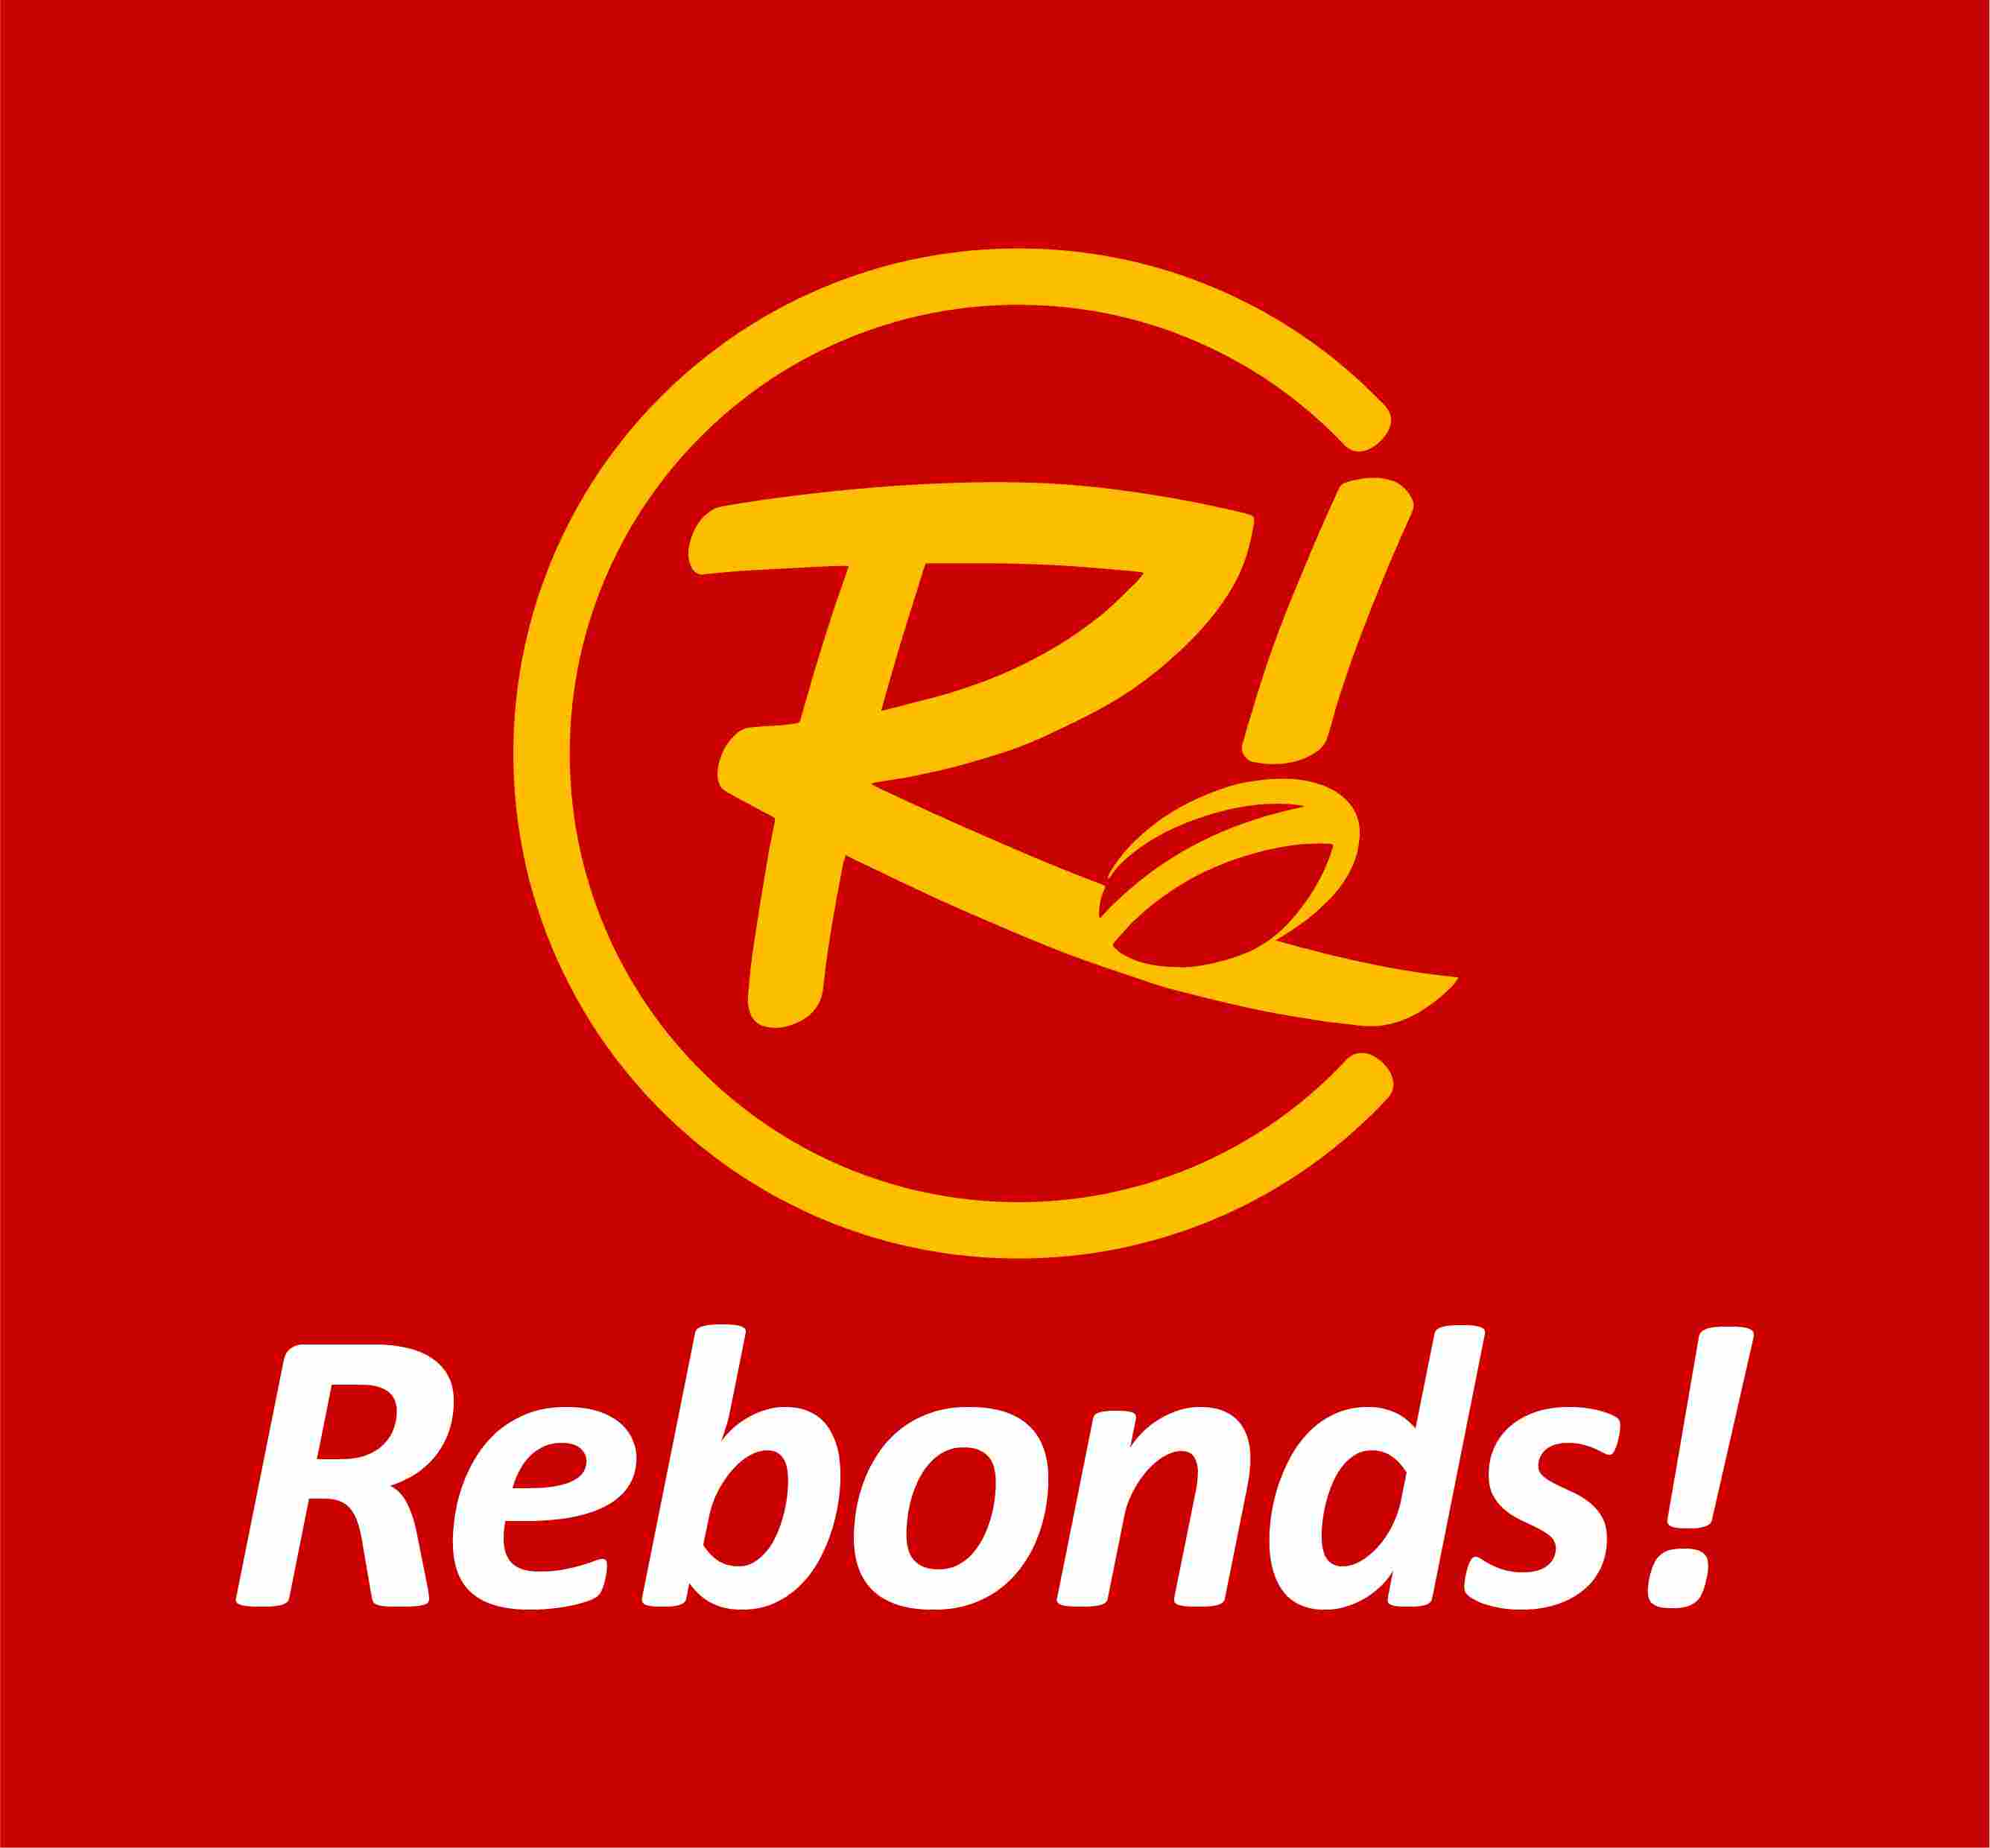 REBONDS !